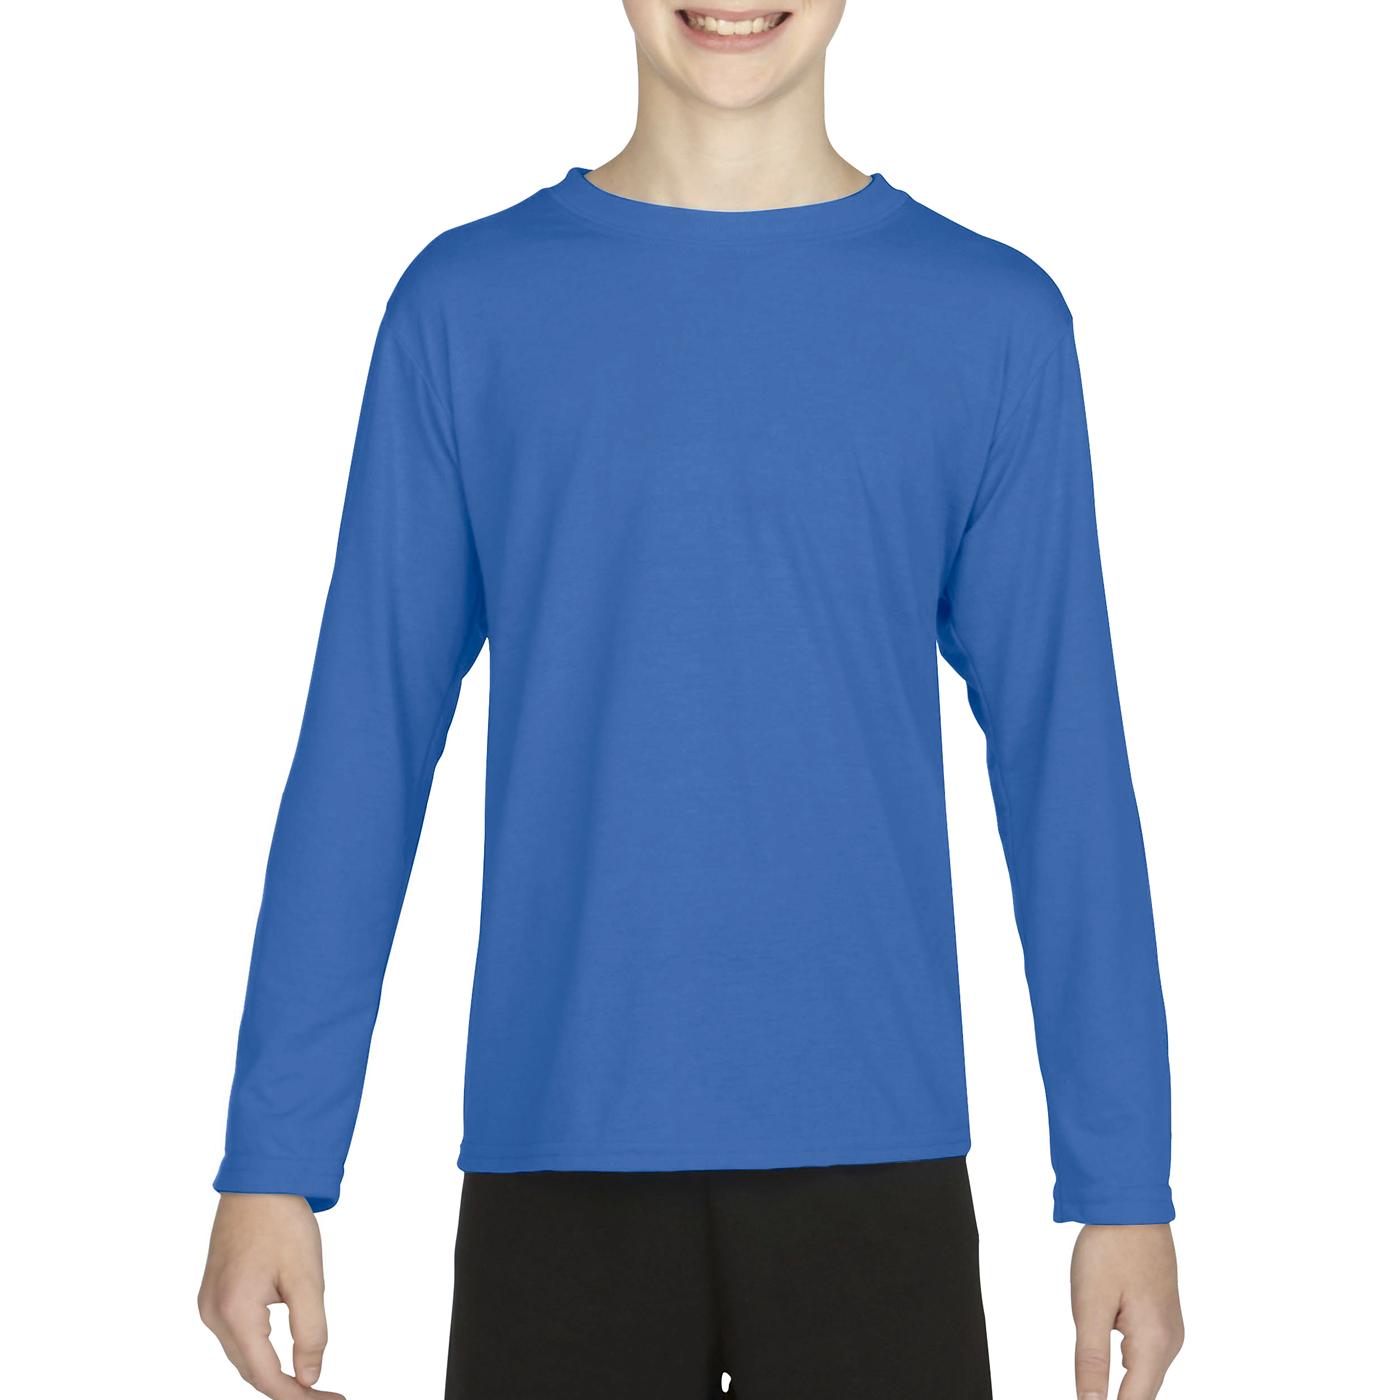 Gildan AquaFX Performance Long Sleeve T.